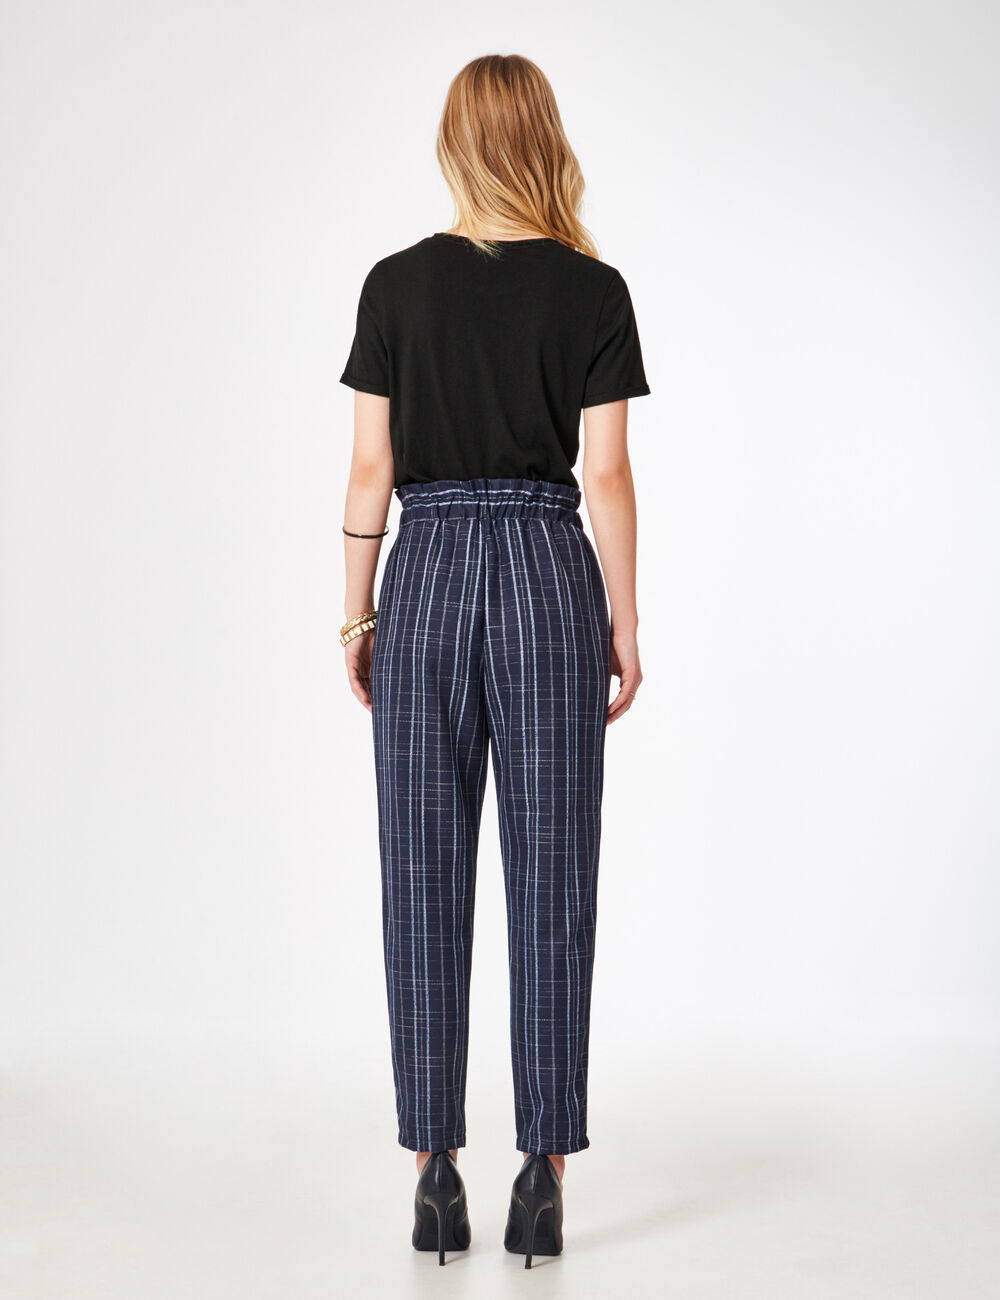 Pantalon carreaux bleu marine femme jennyfer for Pantalon carreaux